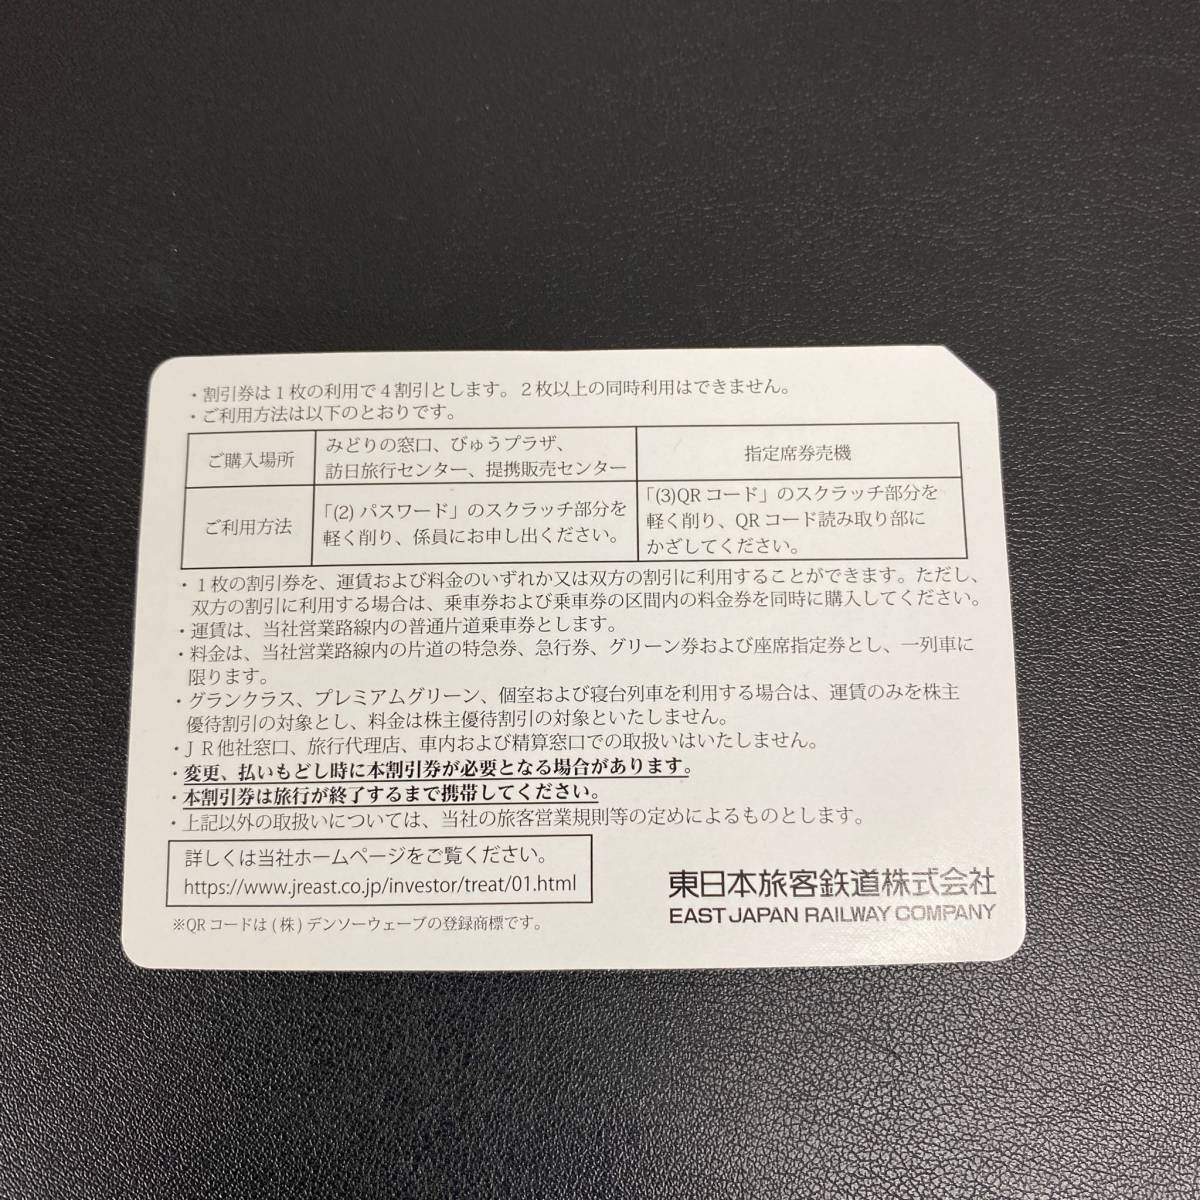 【A4912】東日本旅客鉄道 株主優待 株主優待割引券(1枚) 有効期限 2022年5月31日 運賃・料金4割引 JR東日本 _画像2